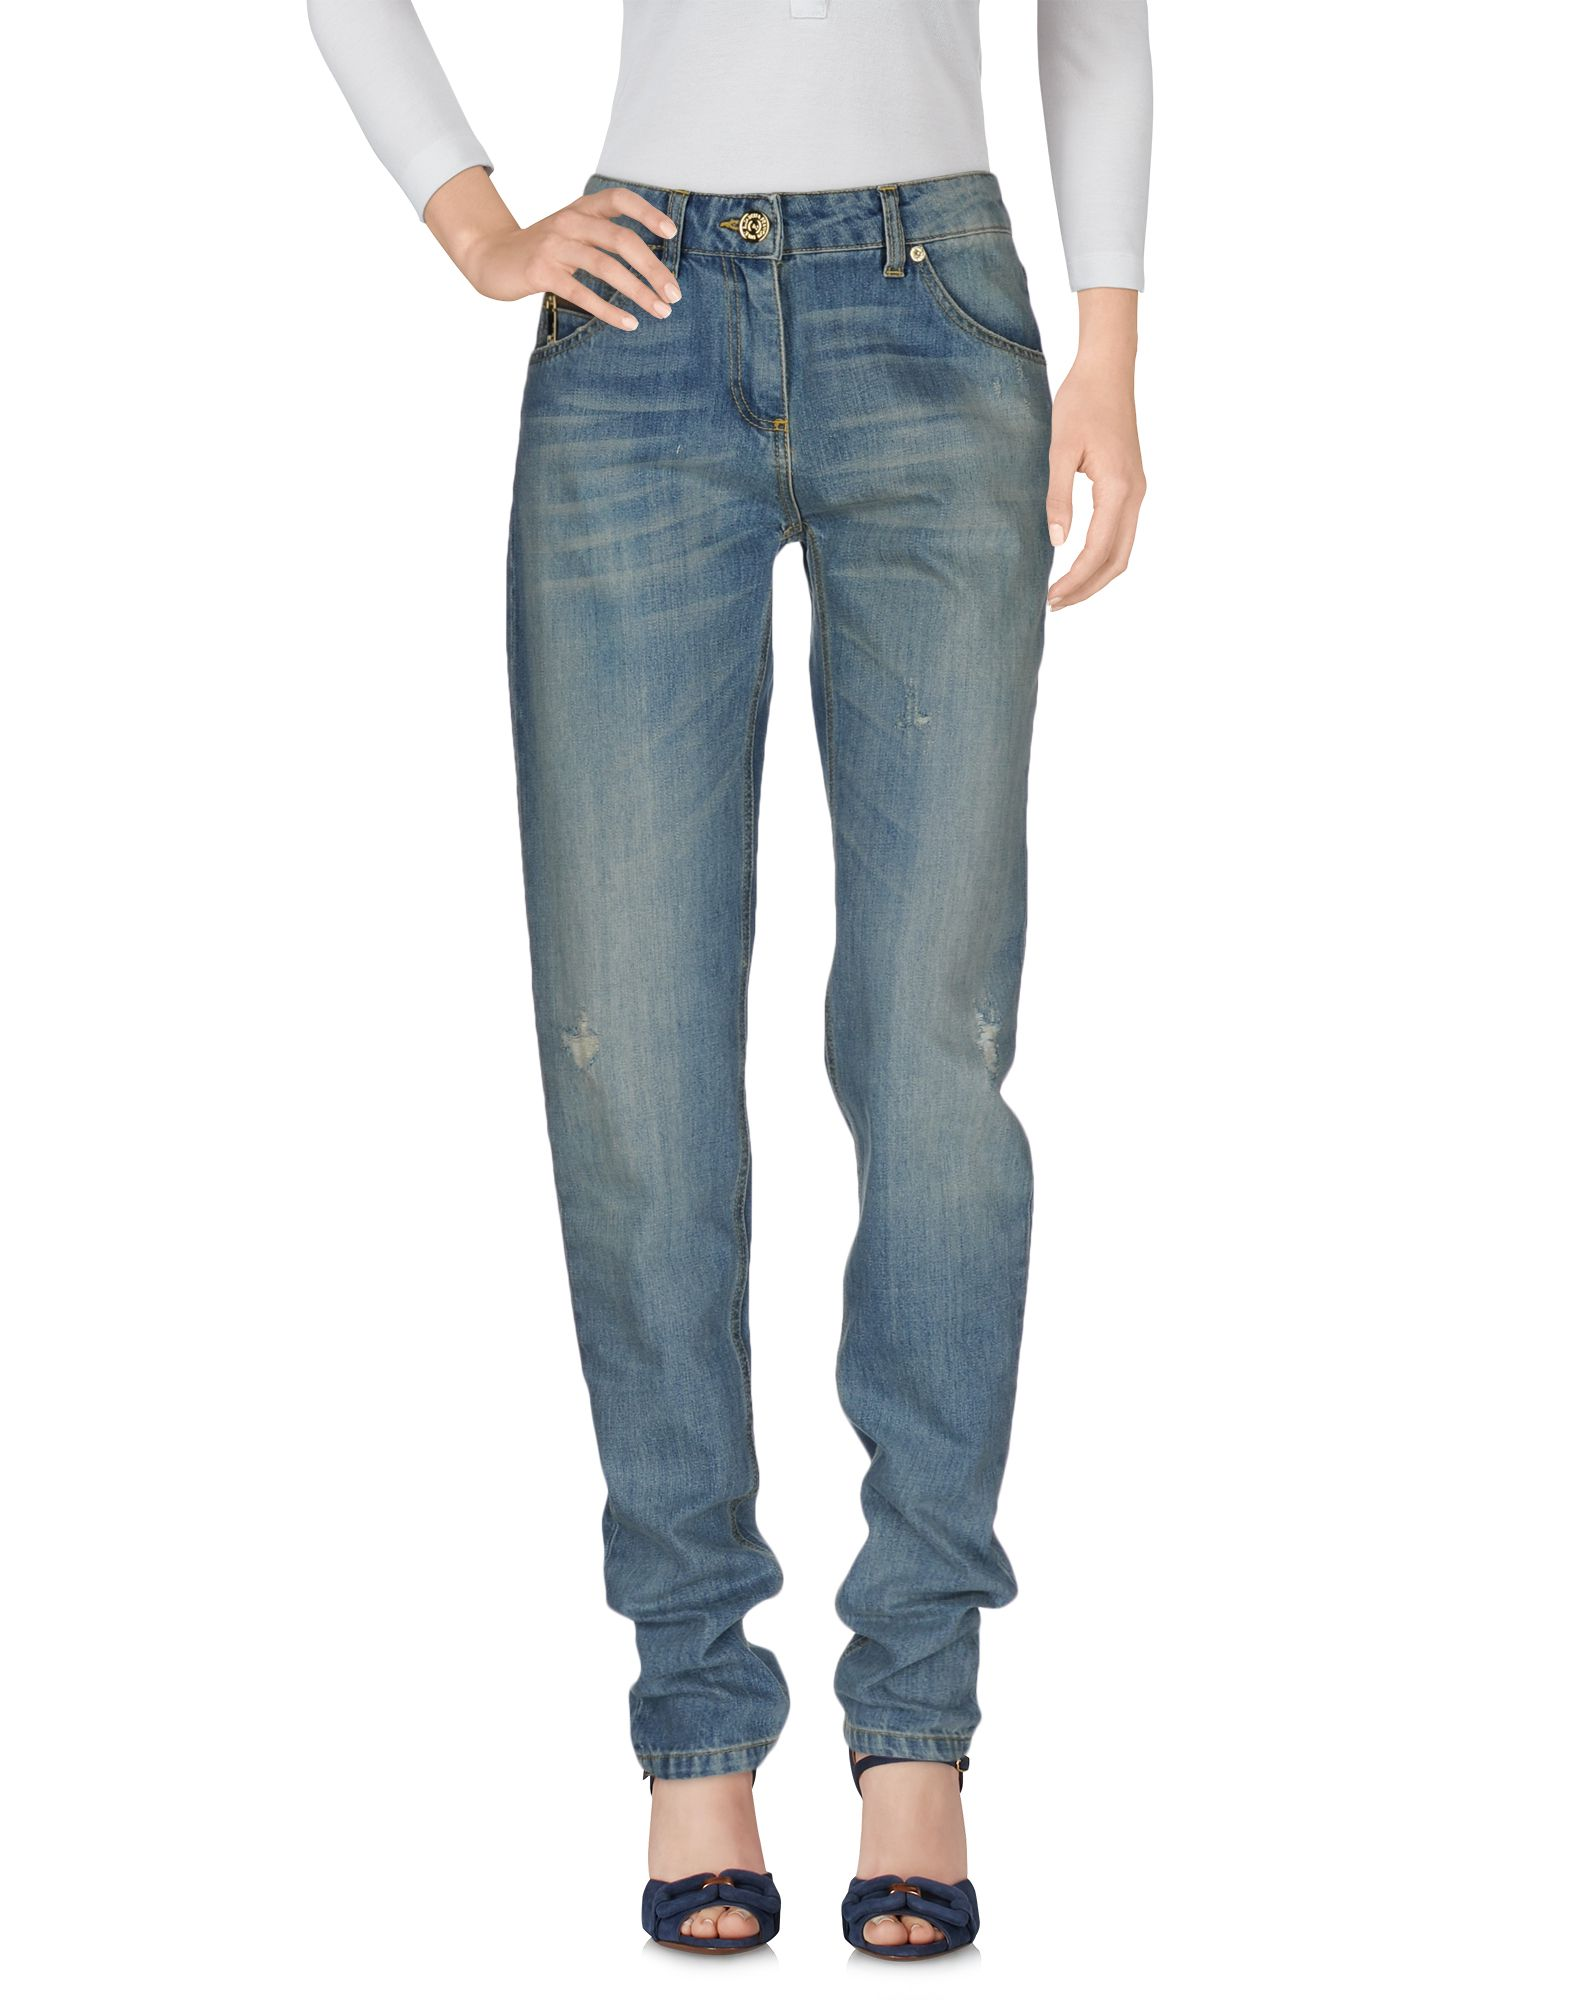 цена ELISABETTA FRANCHI JEANS for CELYN B. Джинсовые брюки онлайн в 2017 году